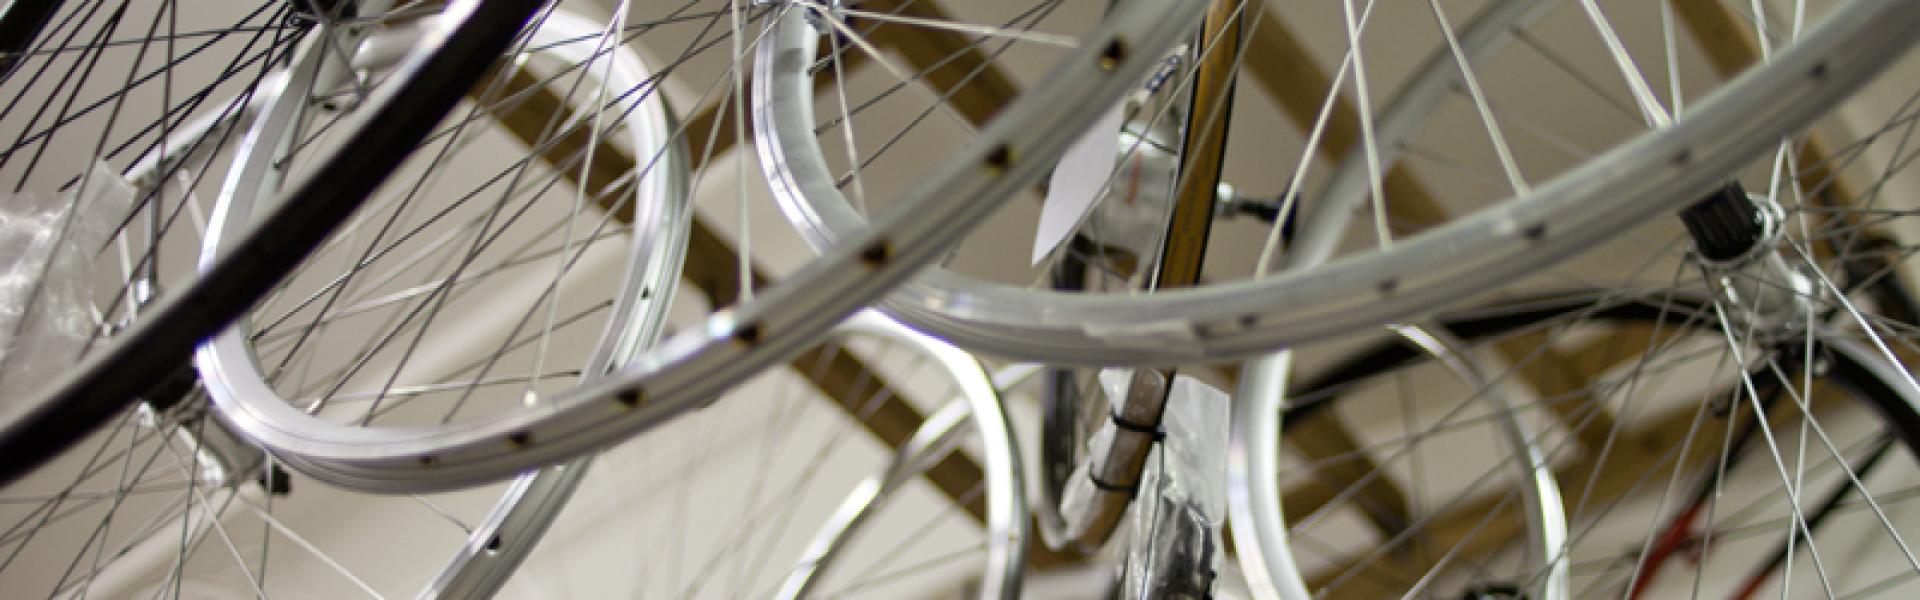 Fahrrad Legard